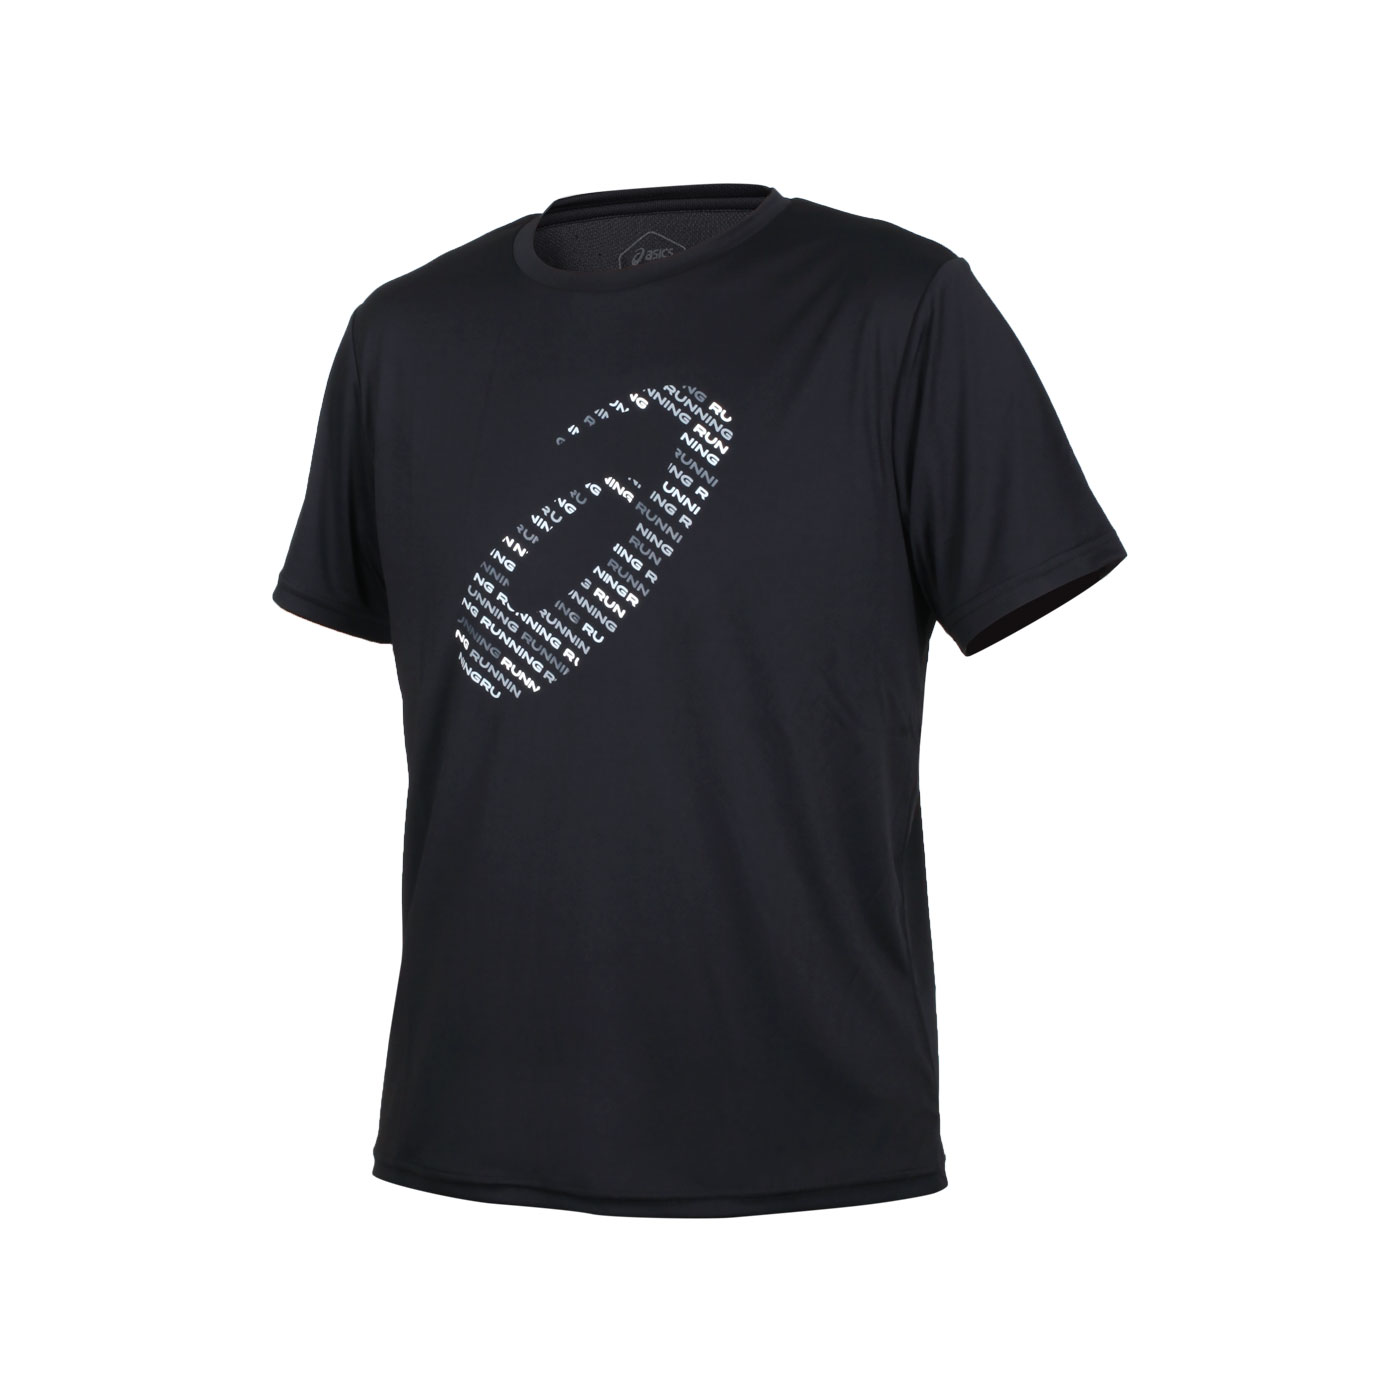 ASICS 男款短袖T恤 2011C348-001